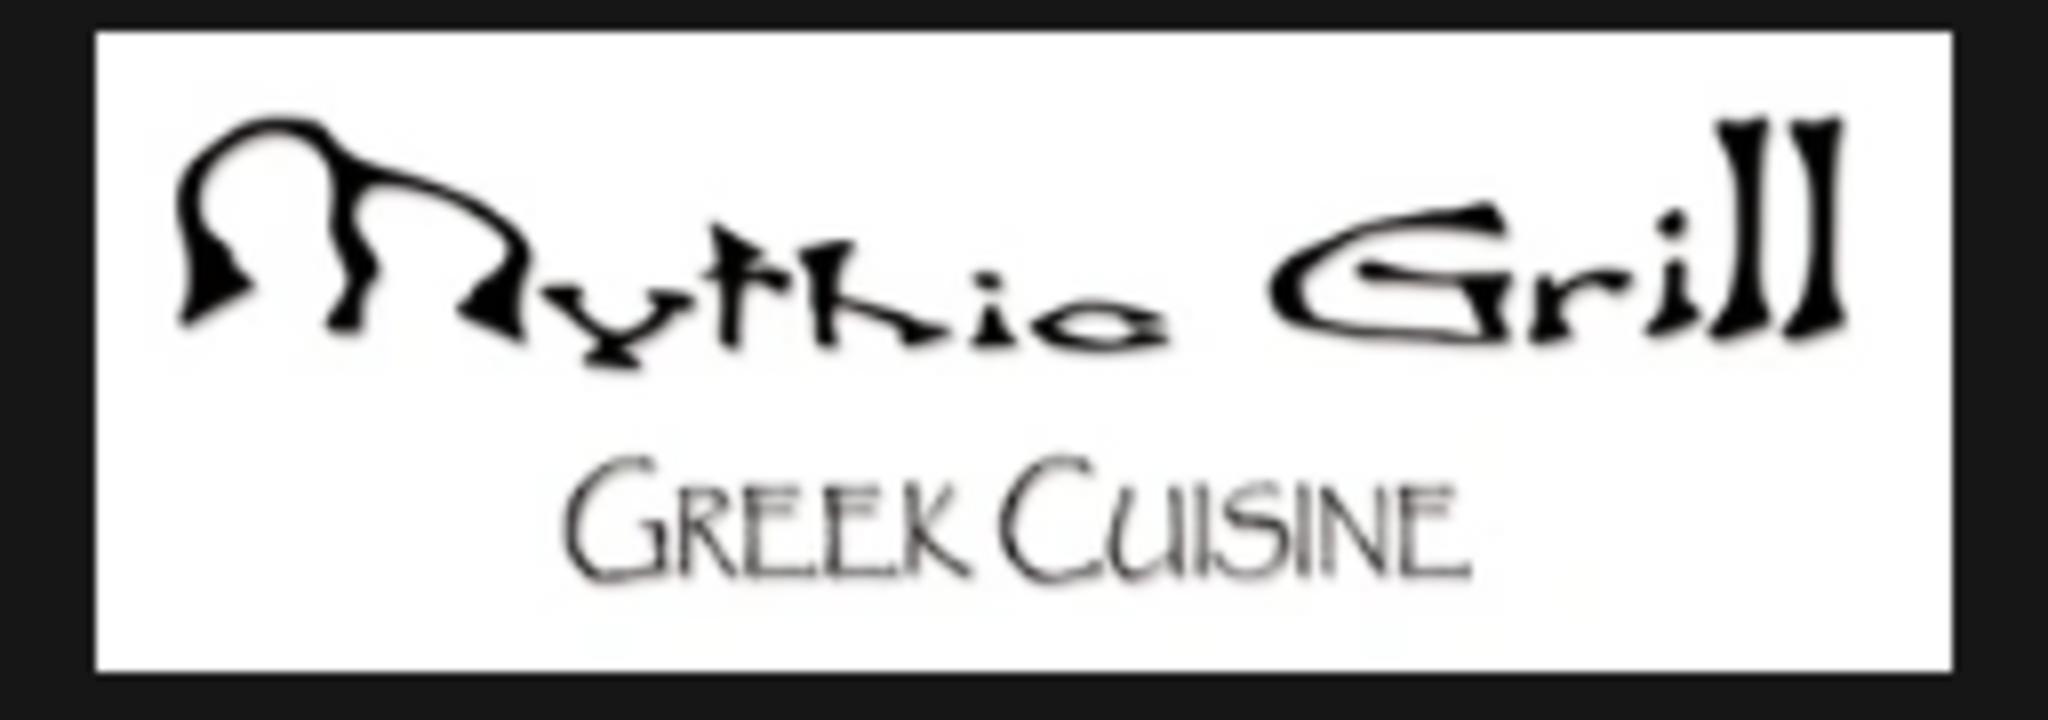 Mythic Grill